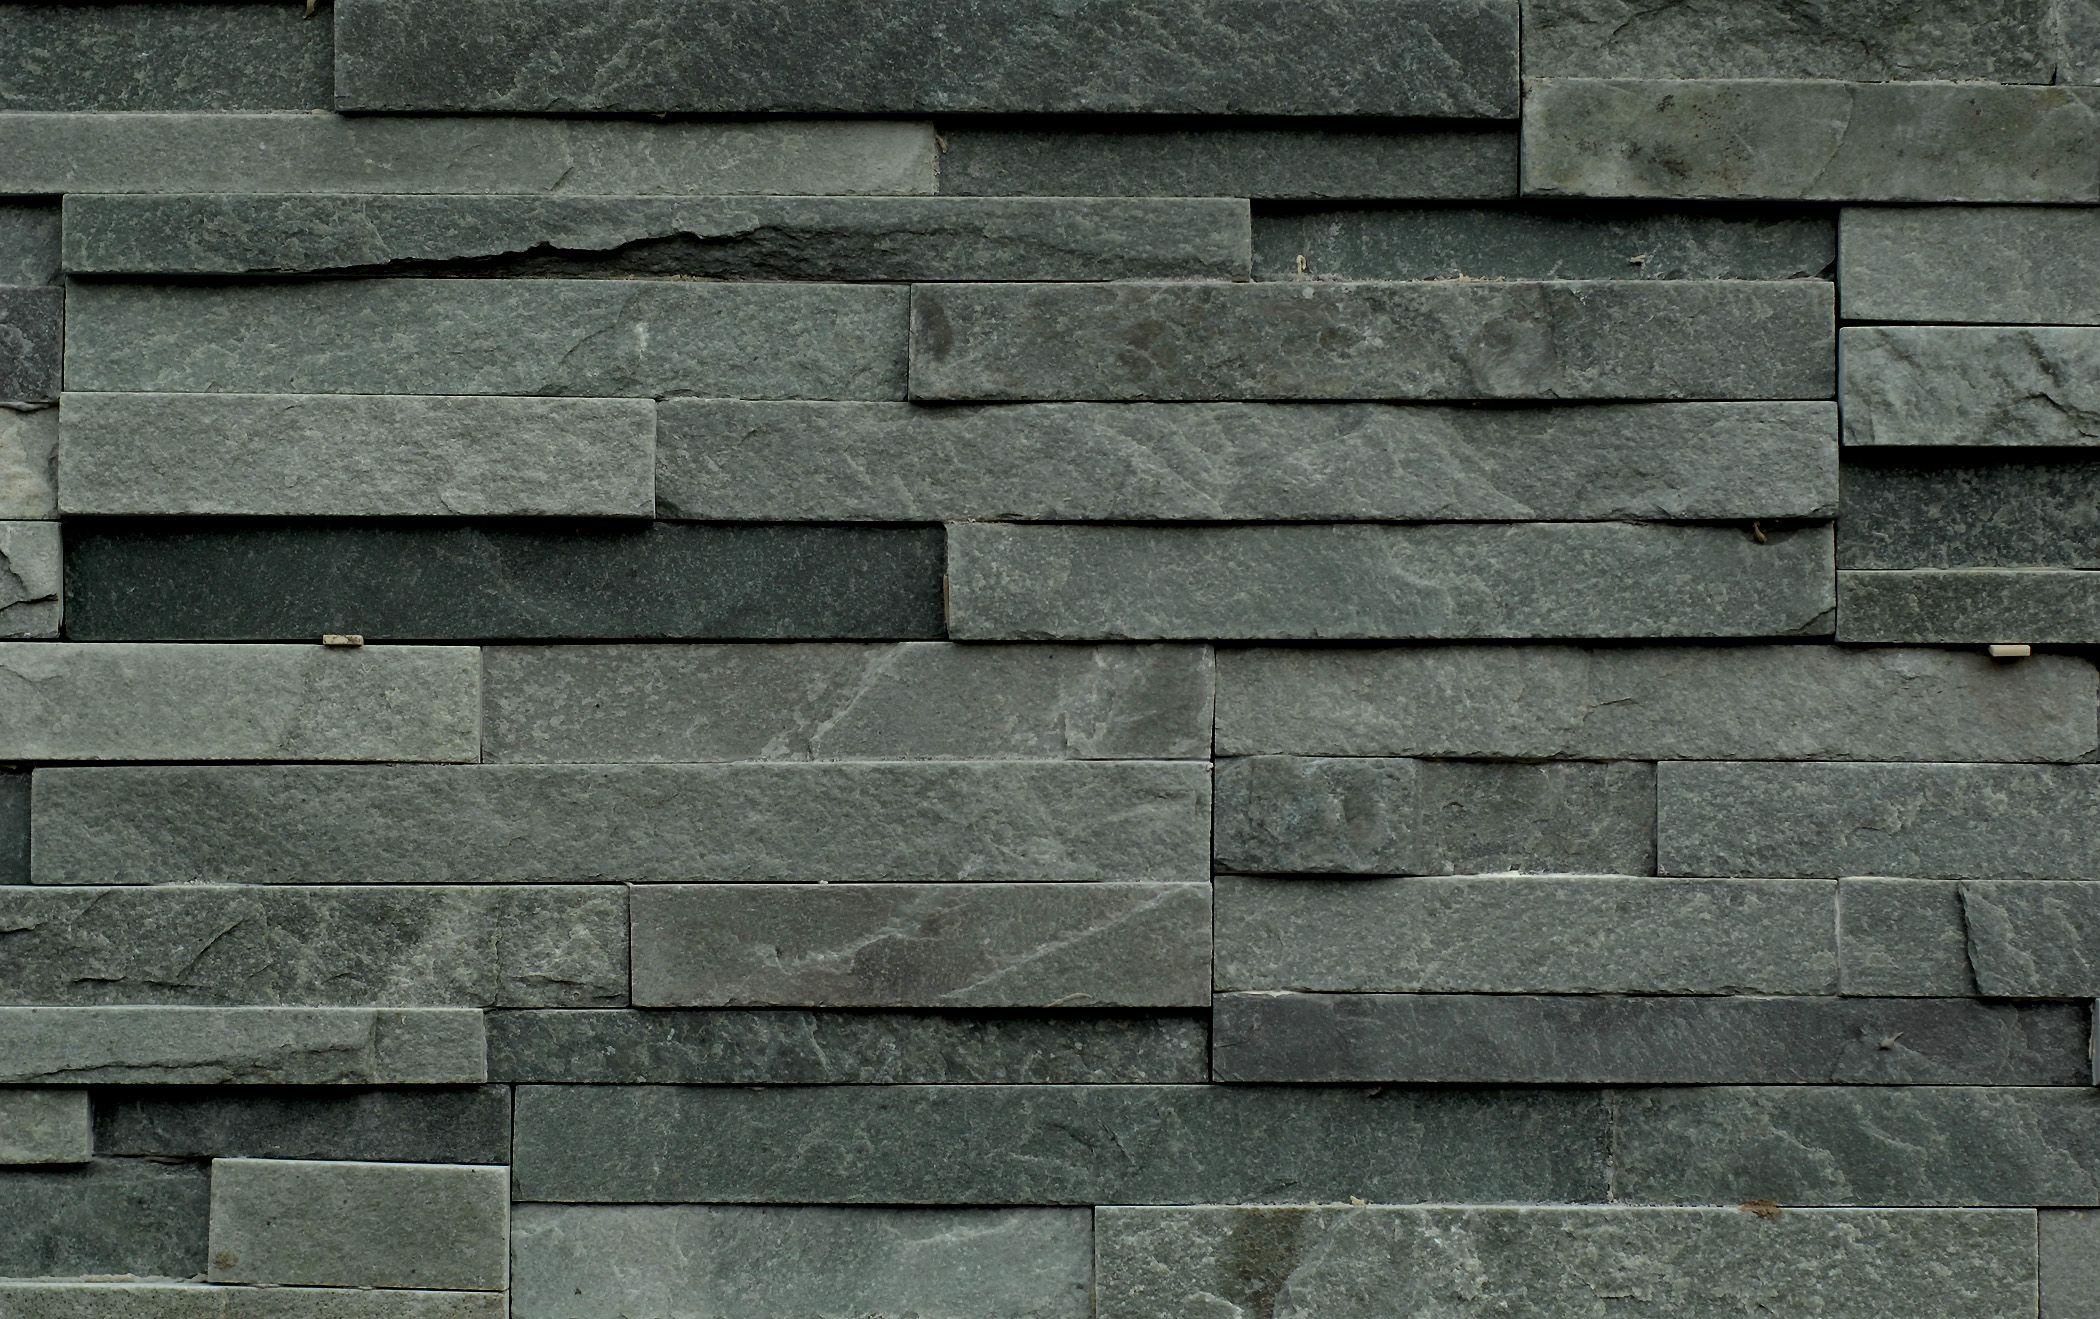 dark stone tile texture. Stone Tiles And Dark Tile Texture  1 Pinterest tiles and Architecture